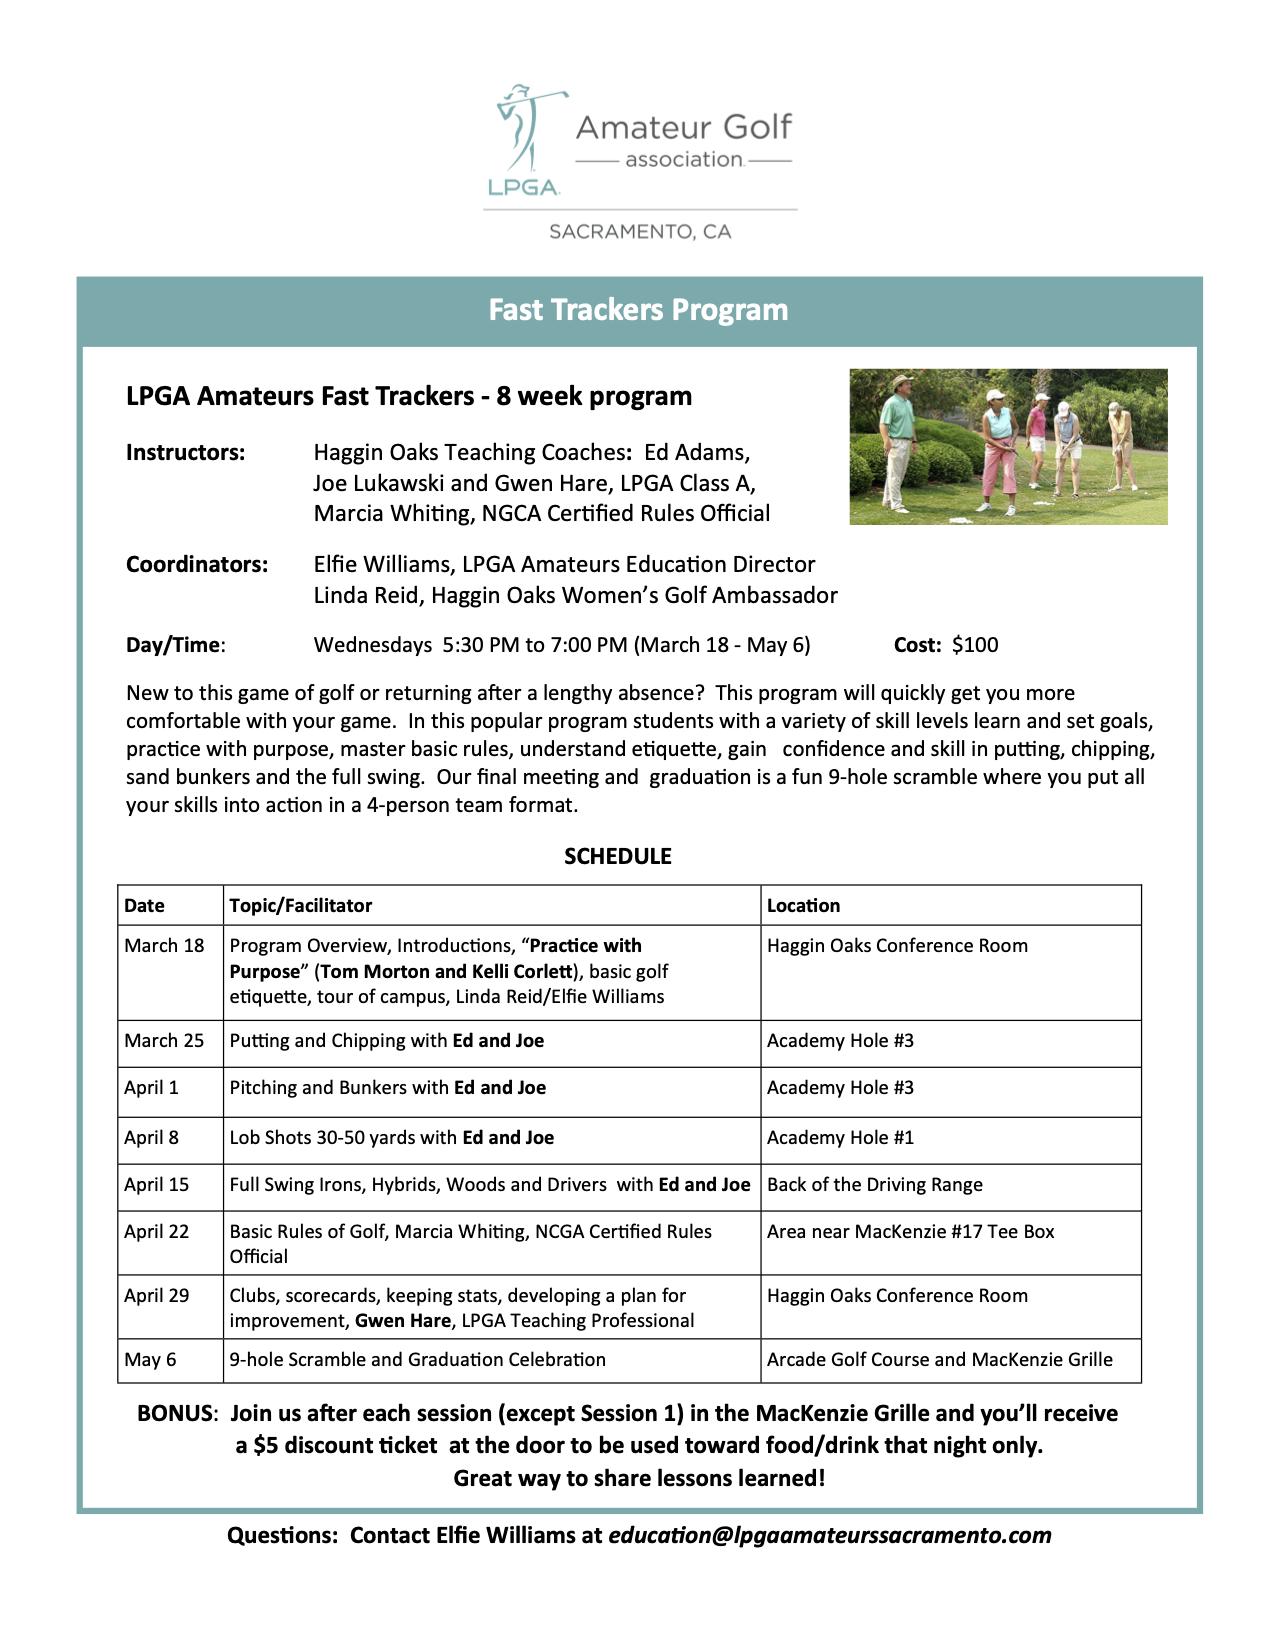 Schedule 2020 Fast Trackers Program Description FINAL